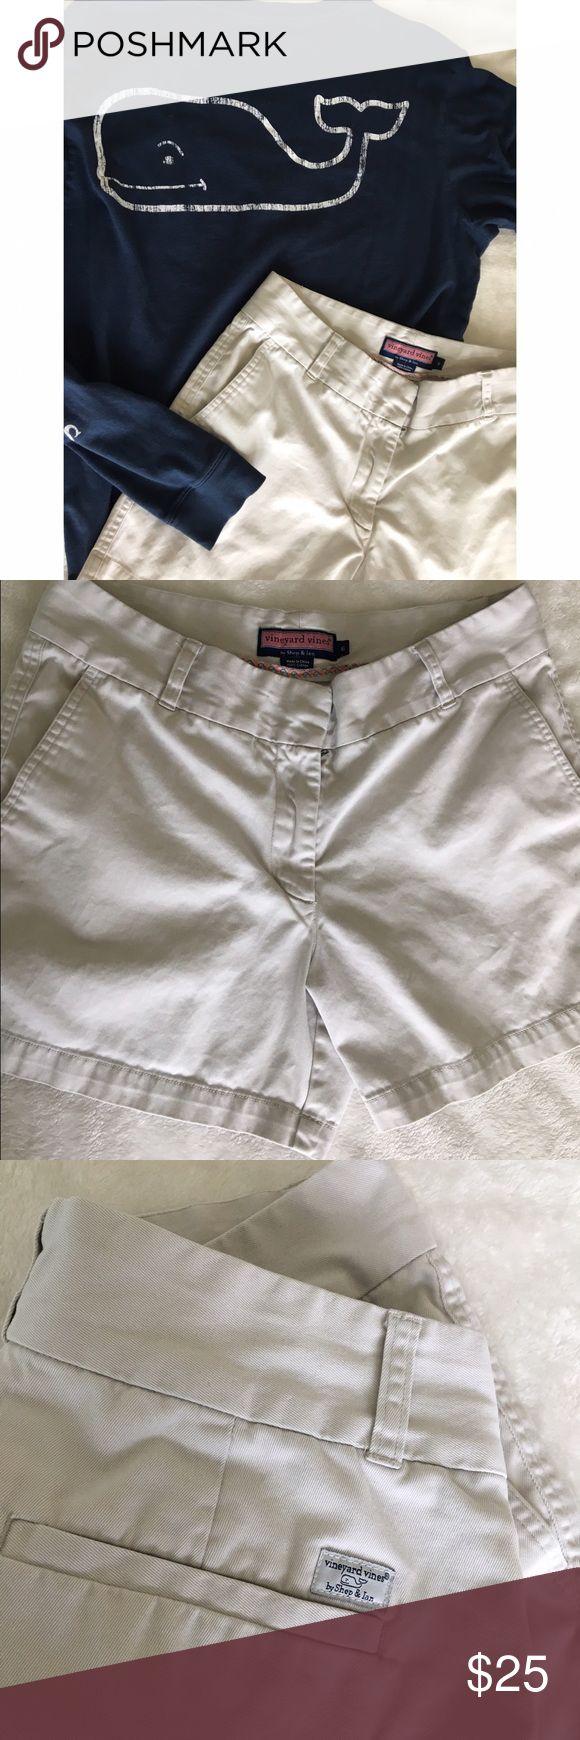 Vineyard Vines beige shorts Cute for the summer casual look. Cotton blend. Light beige color Vineyard Vines Shorts